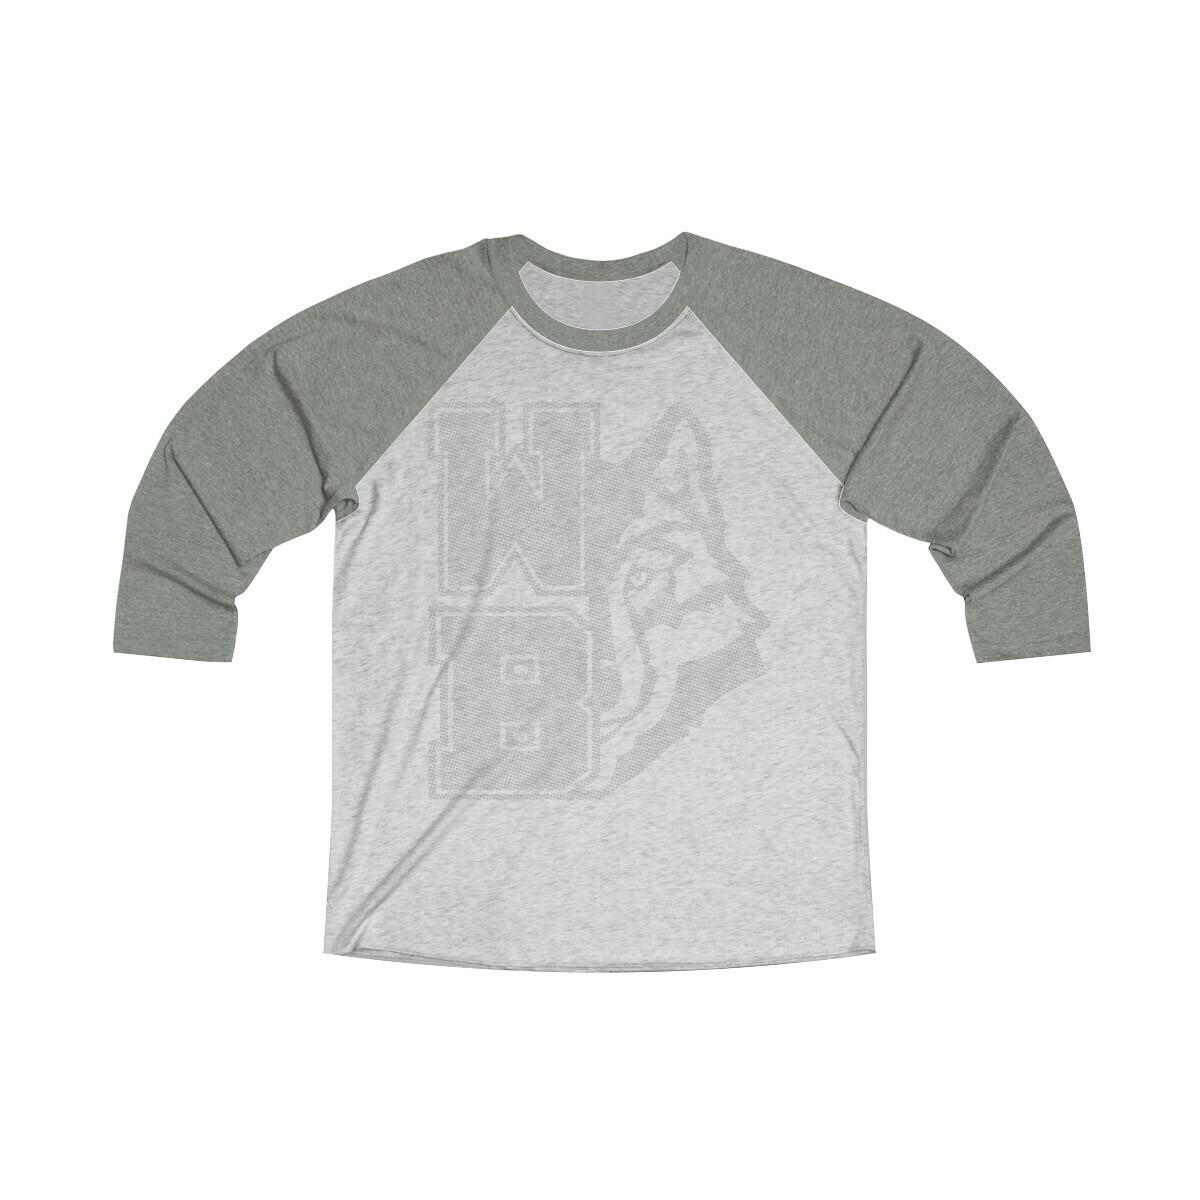 *WB Wolf (G) -Unisex - 3/4 Sleeve Raglan Shirt - Next Level 6051